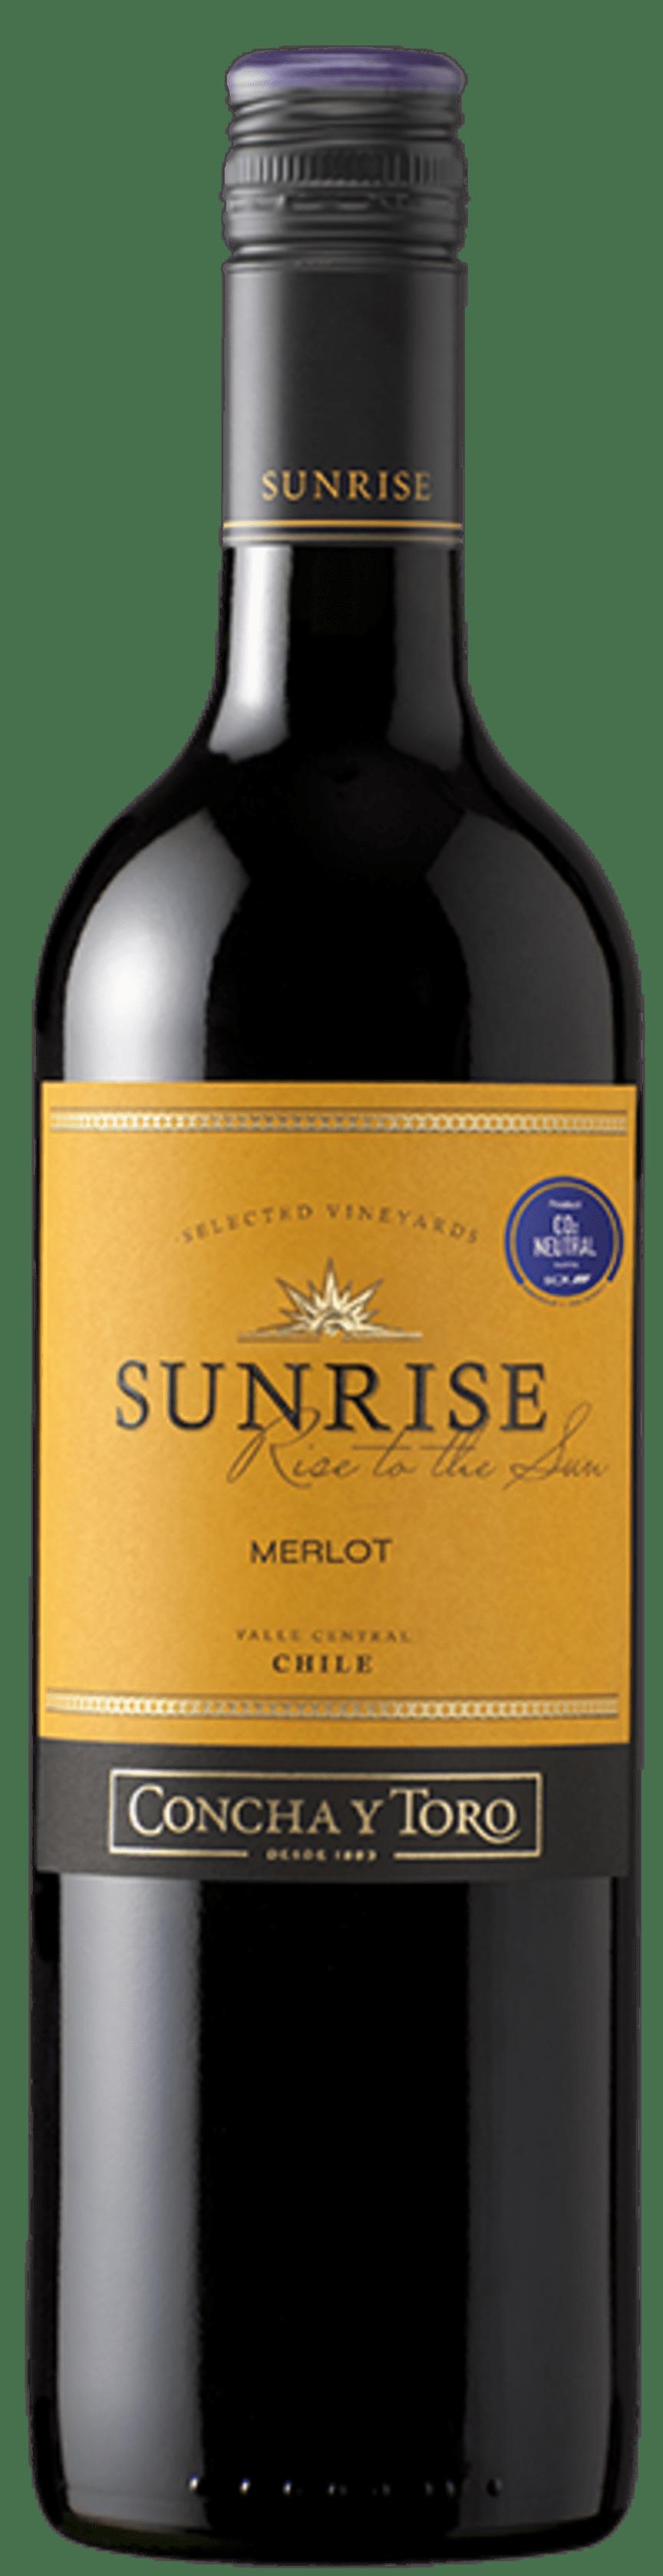 Sunrise Merlot (nr 6519)